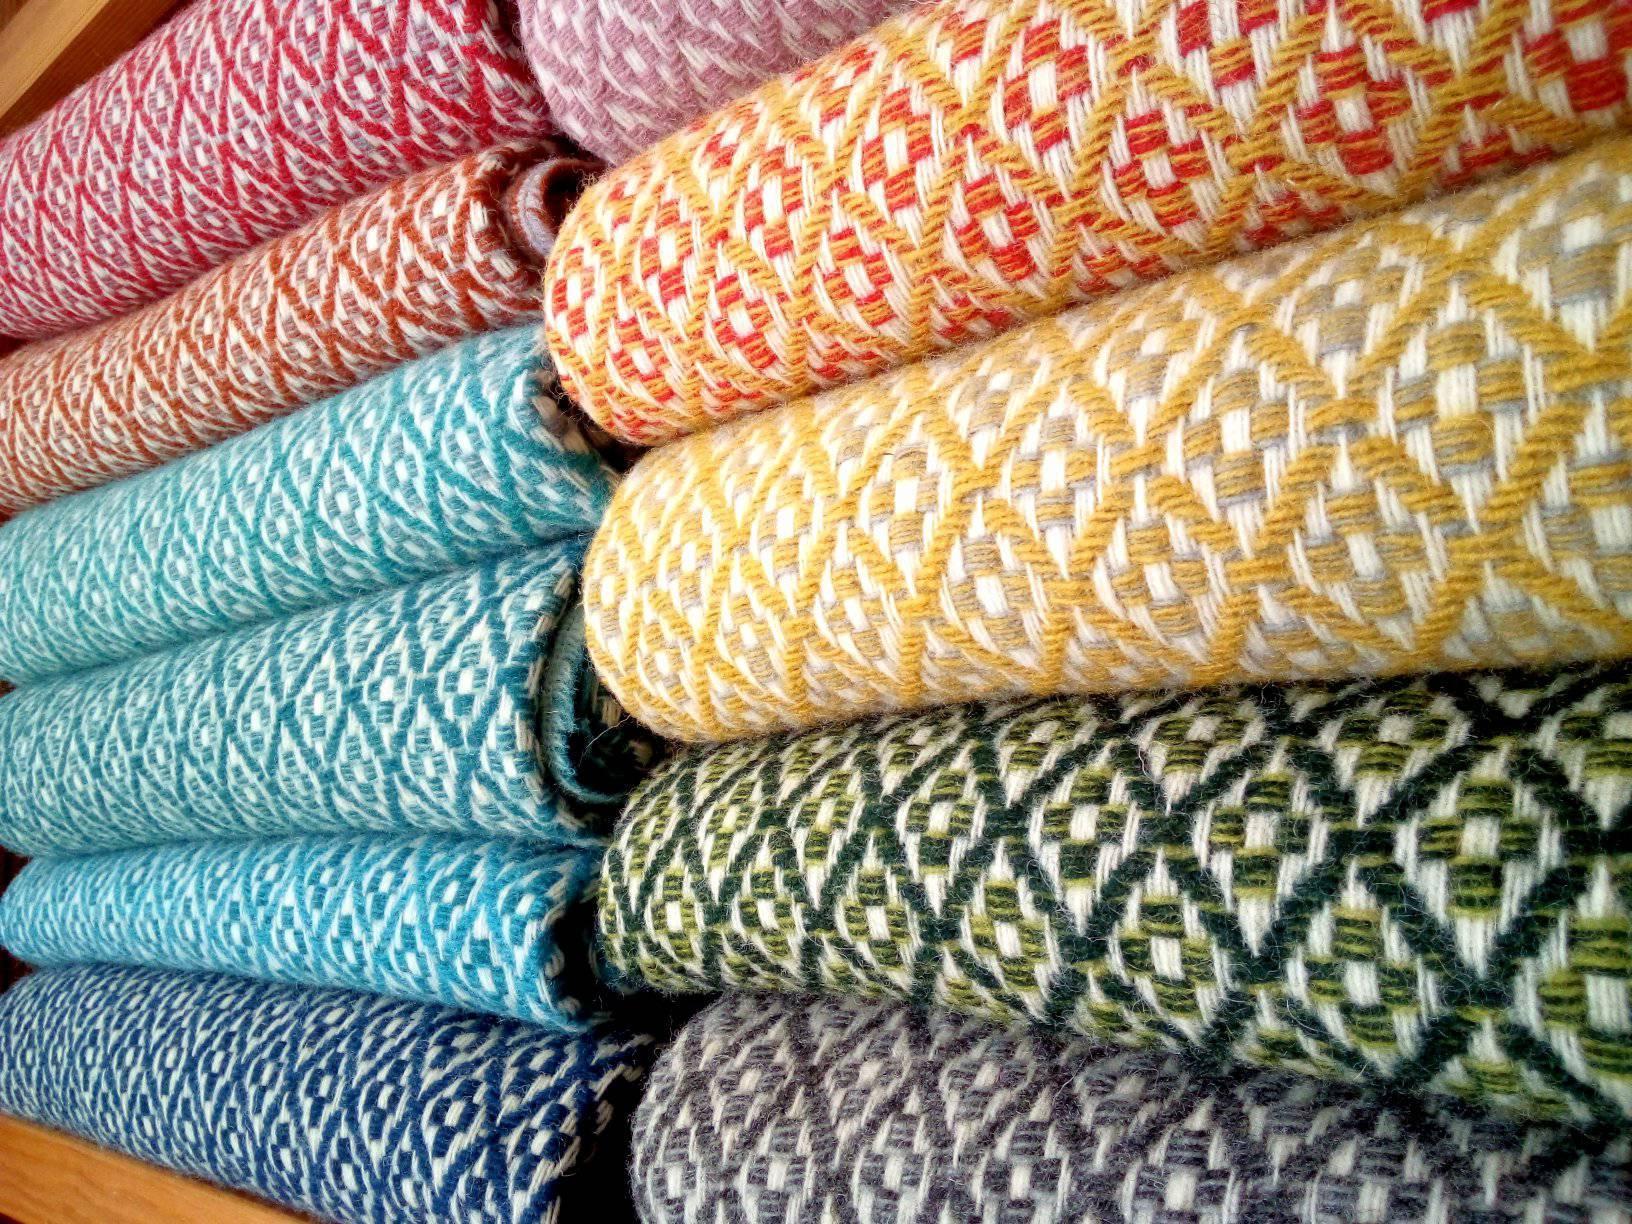 Tapetes de tecelagem de pura lã